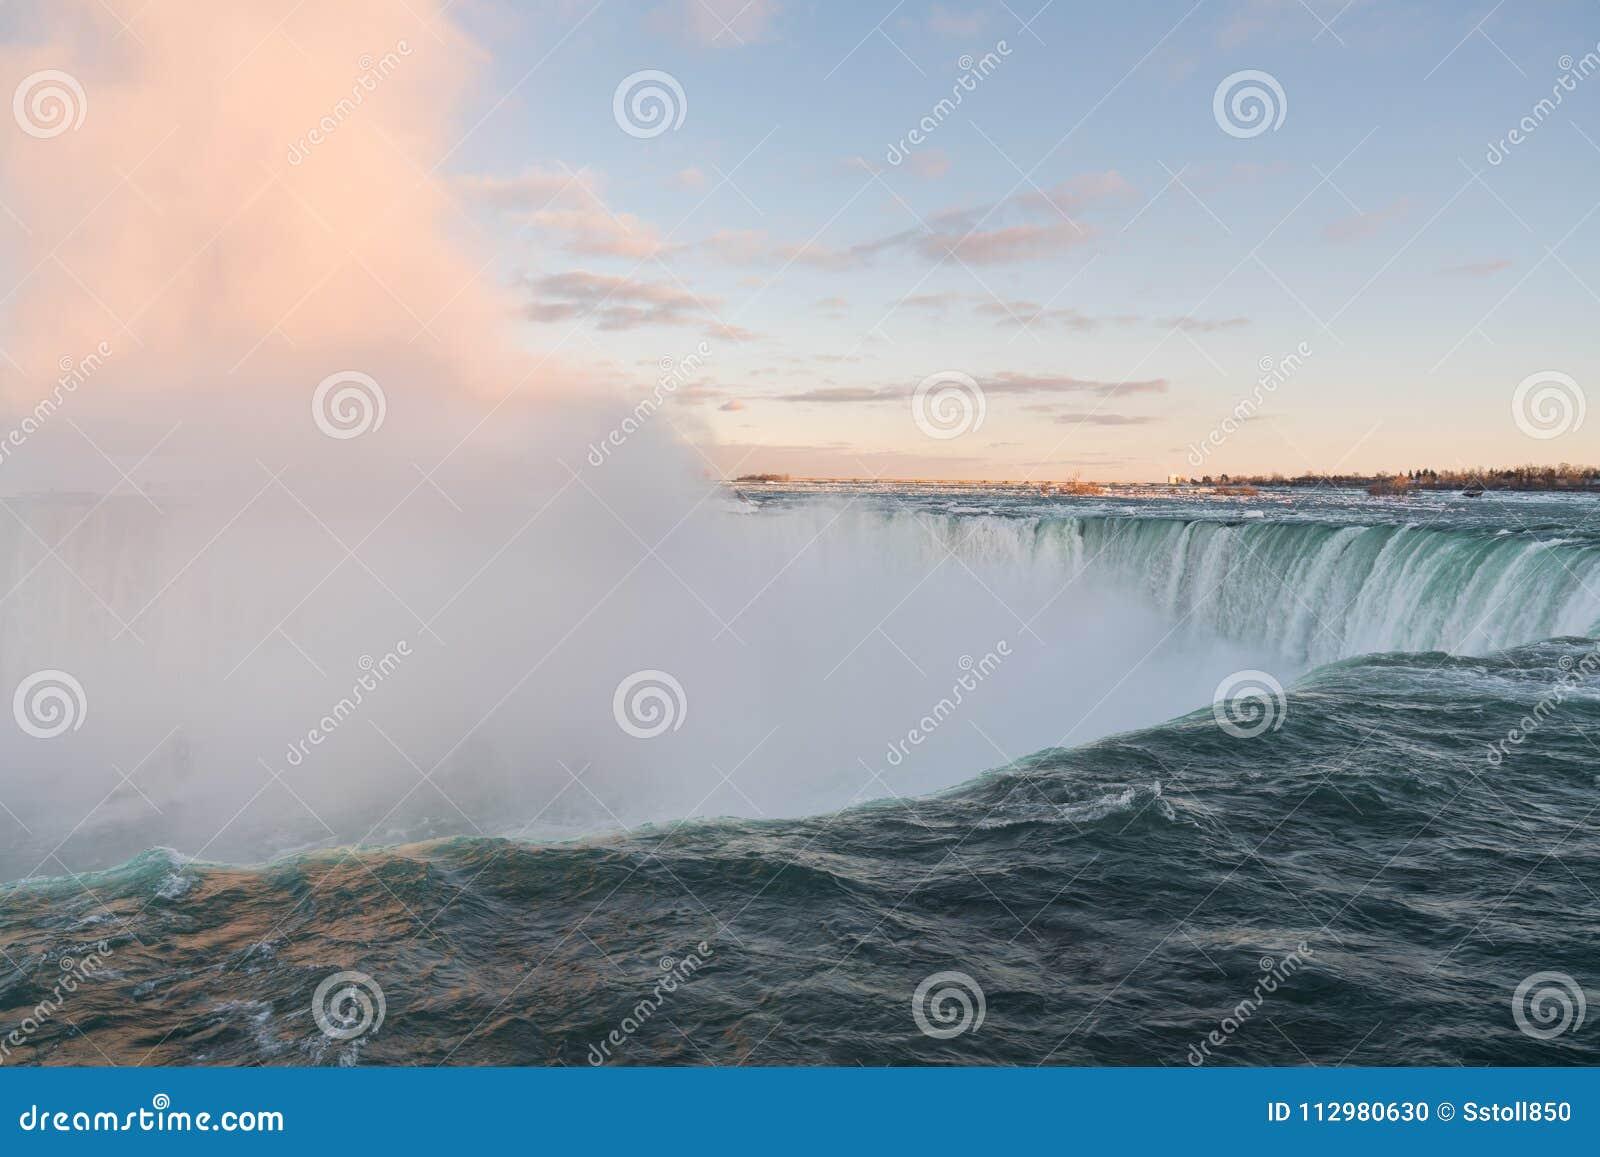 Horseshoe Falls at Niagara Falls up close